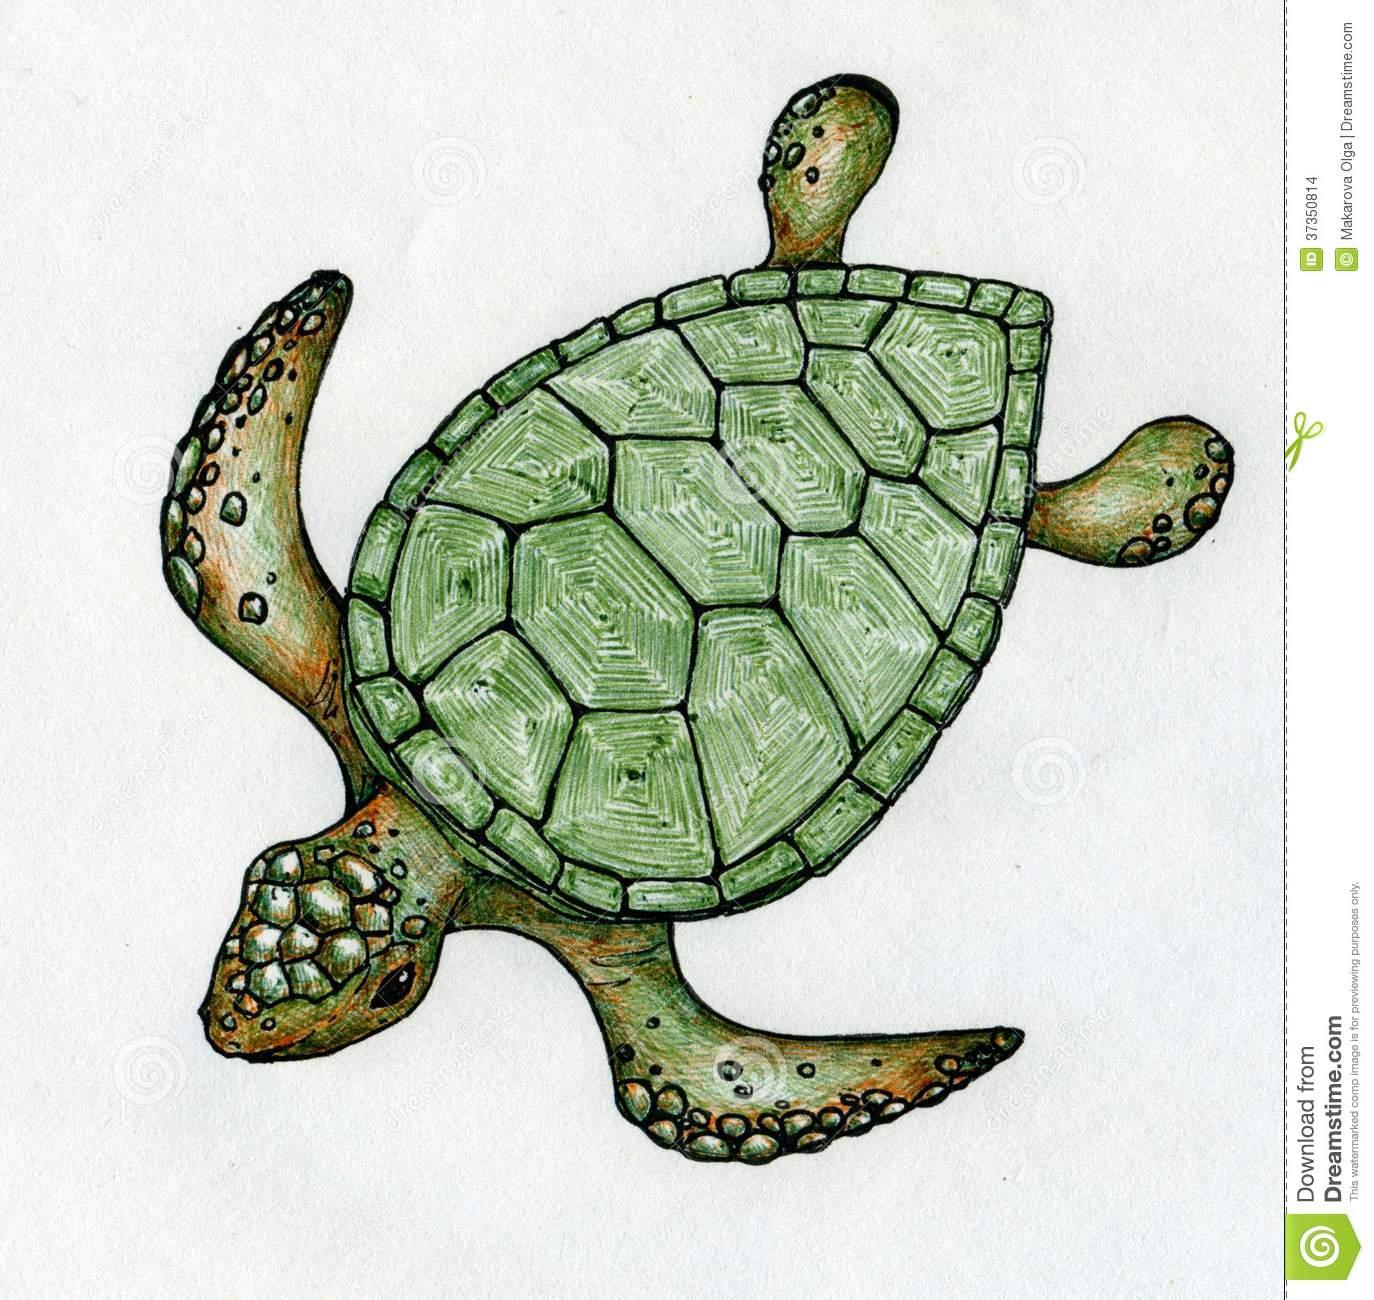 1374x1300 Turtle Shell Drawing Swimming Sea Turtle Stock Illustration. Image